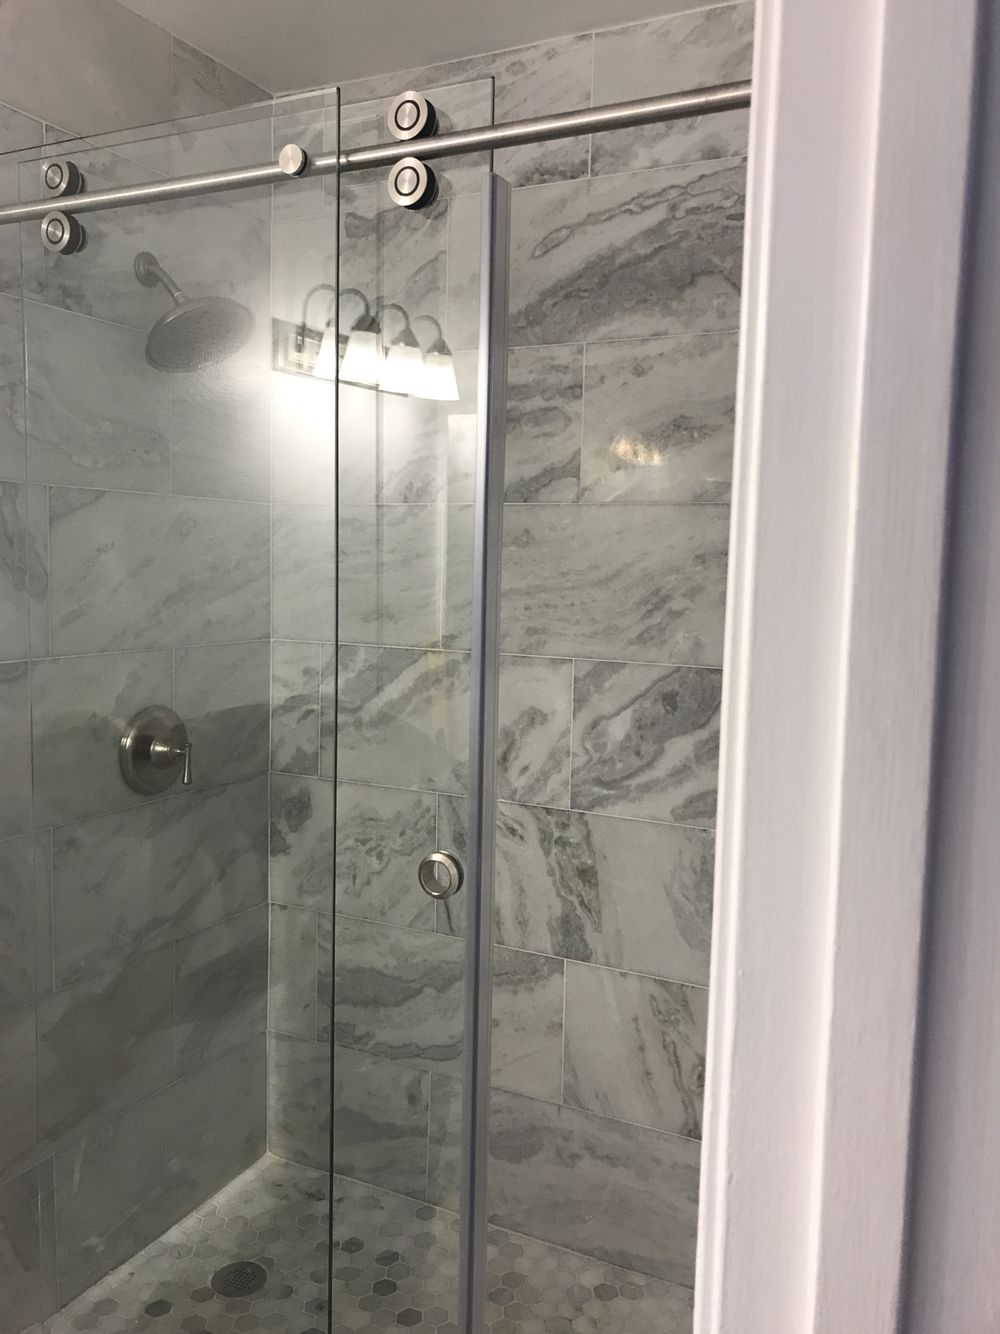 My bathroom in progress sahara carrara marble tile wall tile and my bathroom in progress sahara carrara marble tile wall tile and bathroom floor and carrara white hexagon marble mosaic shower floor tile dailygadgetfo Images